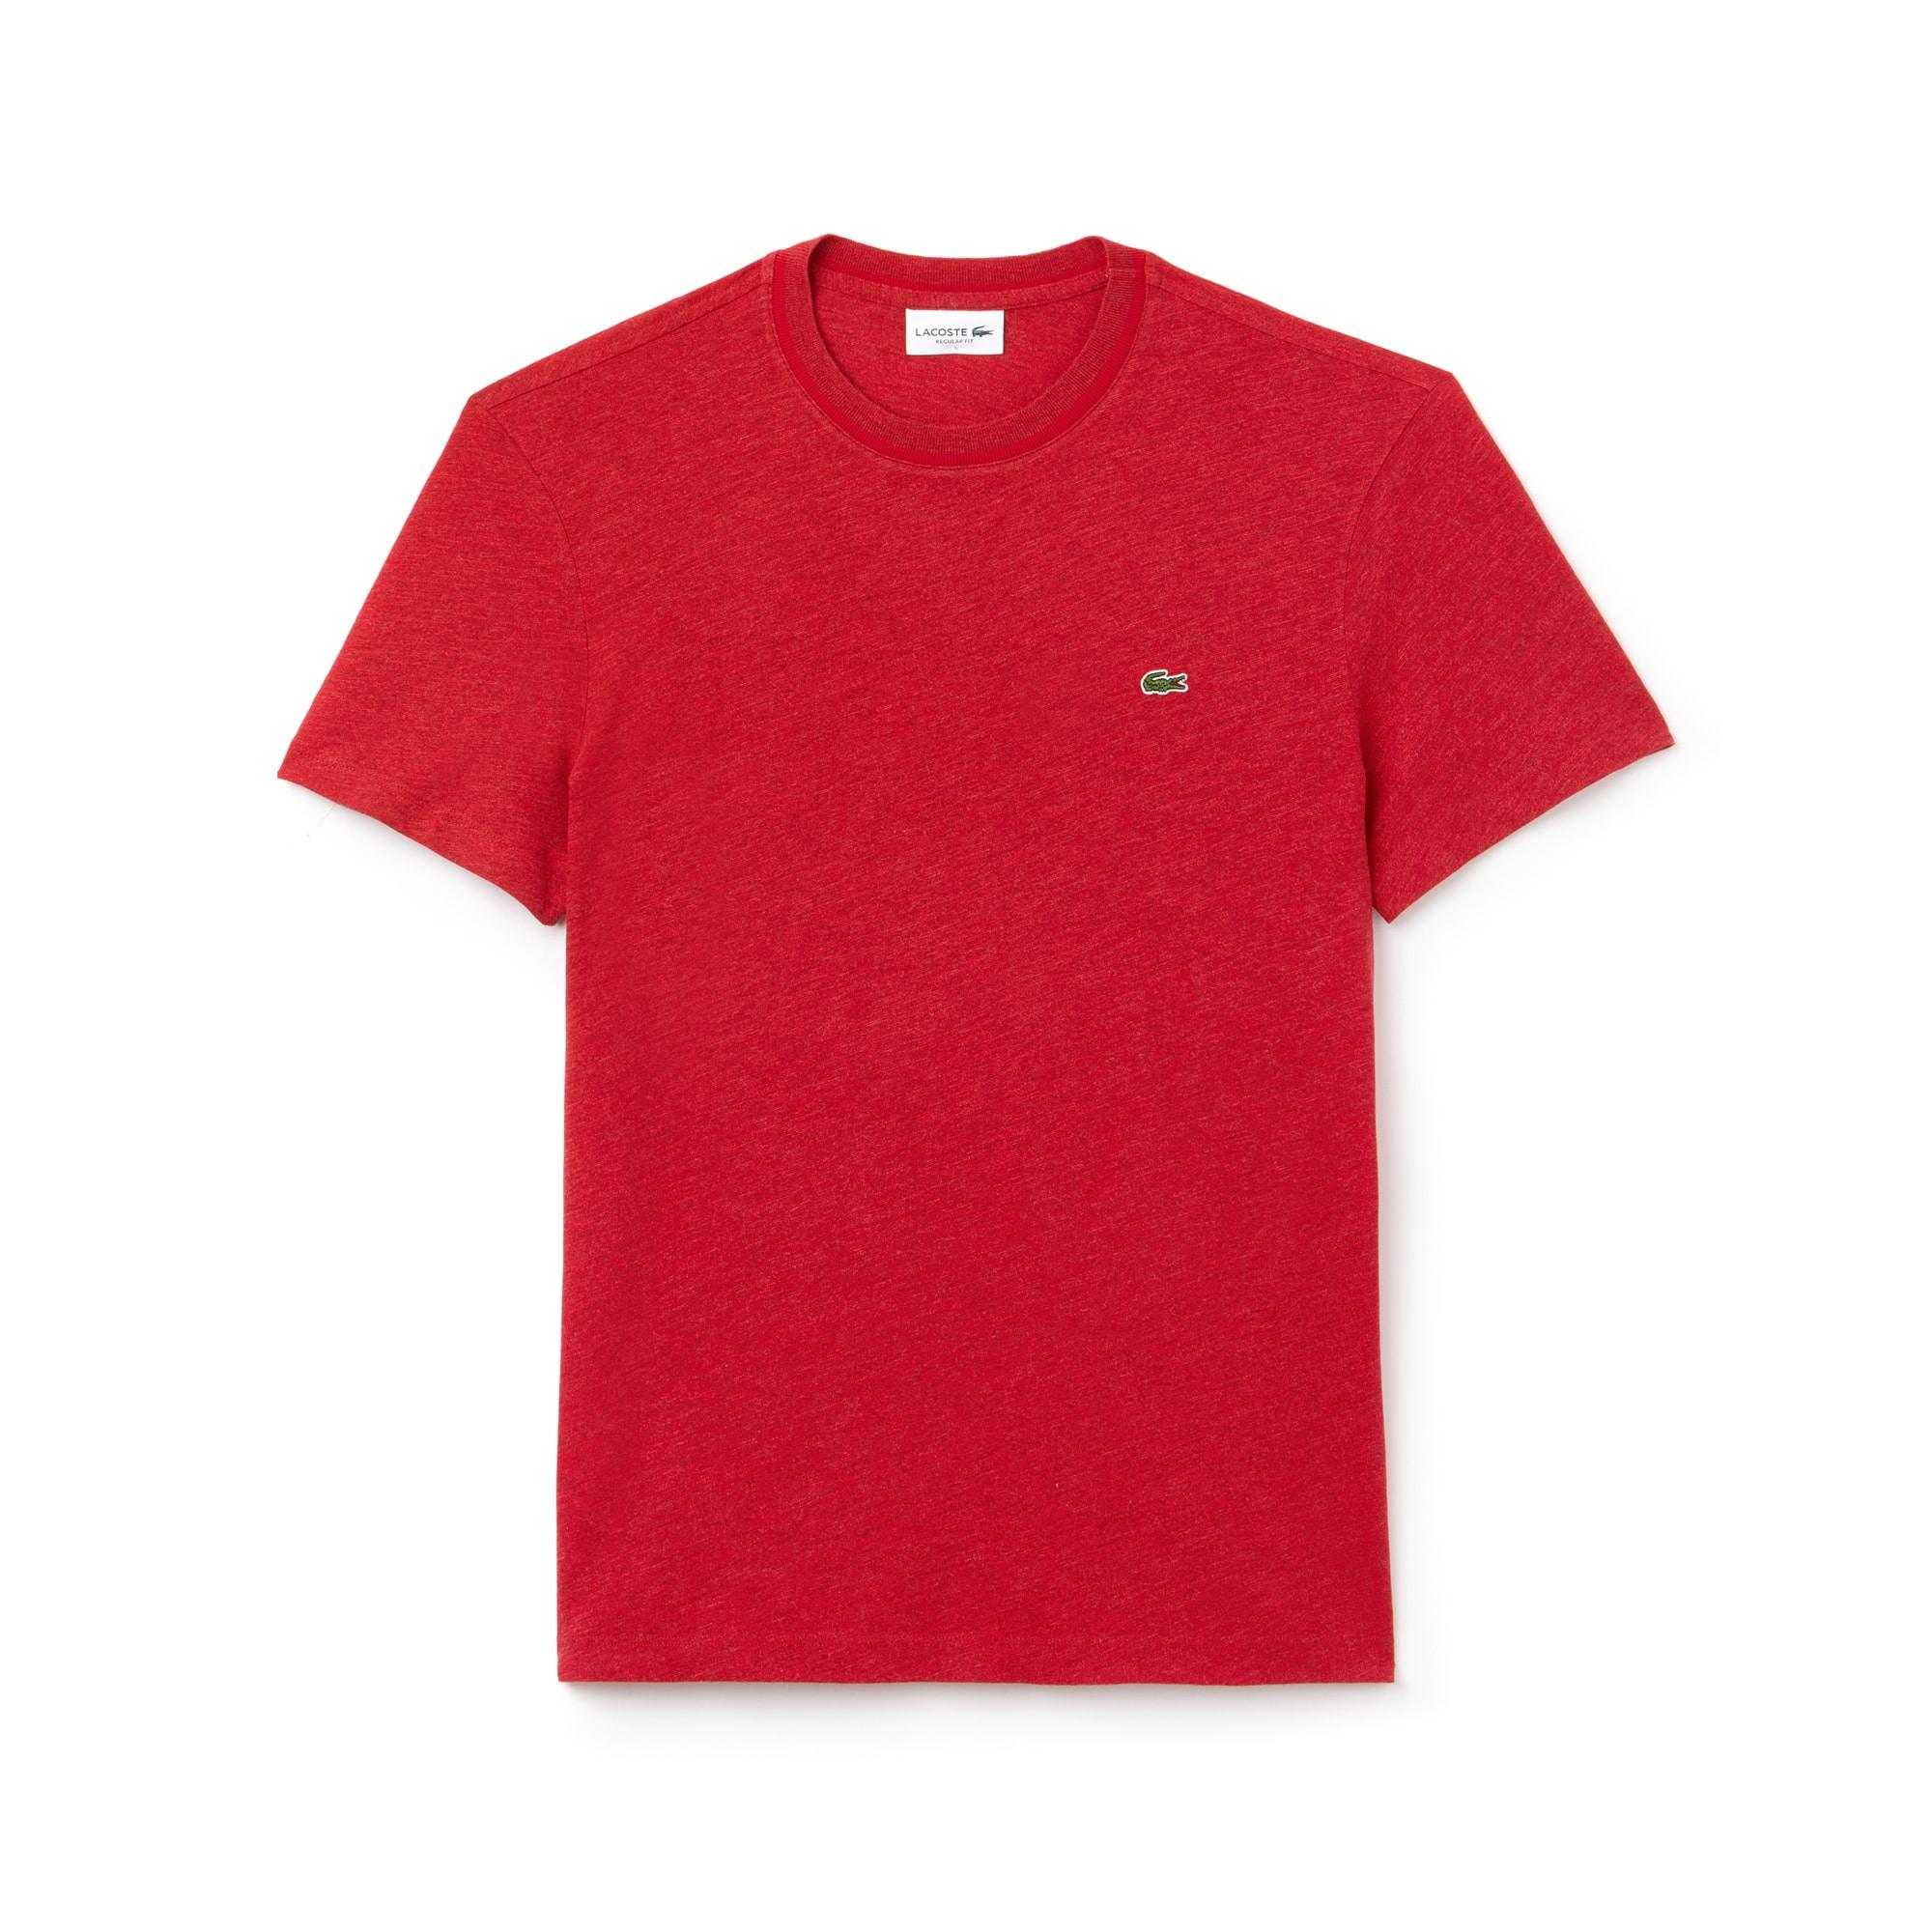 T-shirt heren ronde hals flammé-katoenjersey